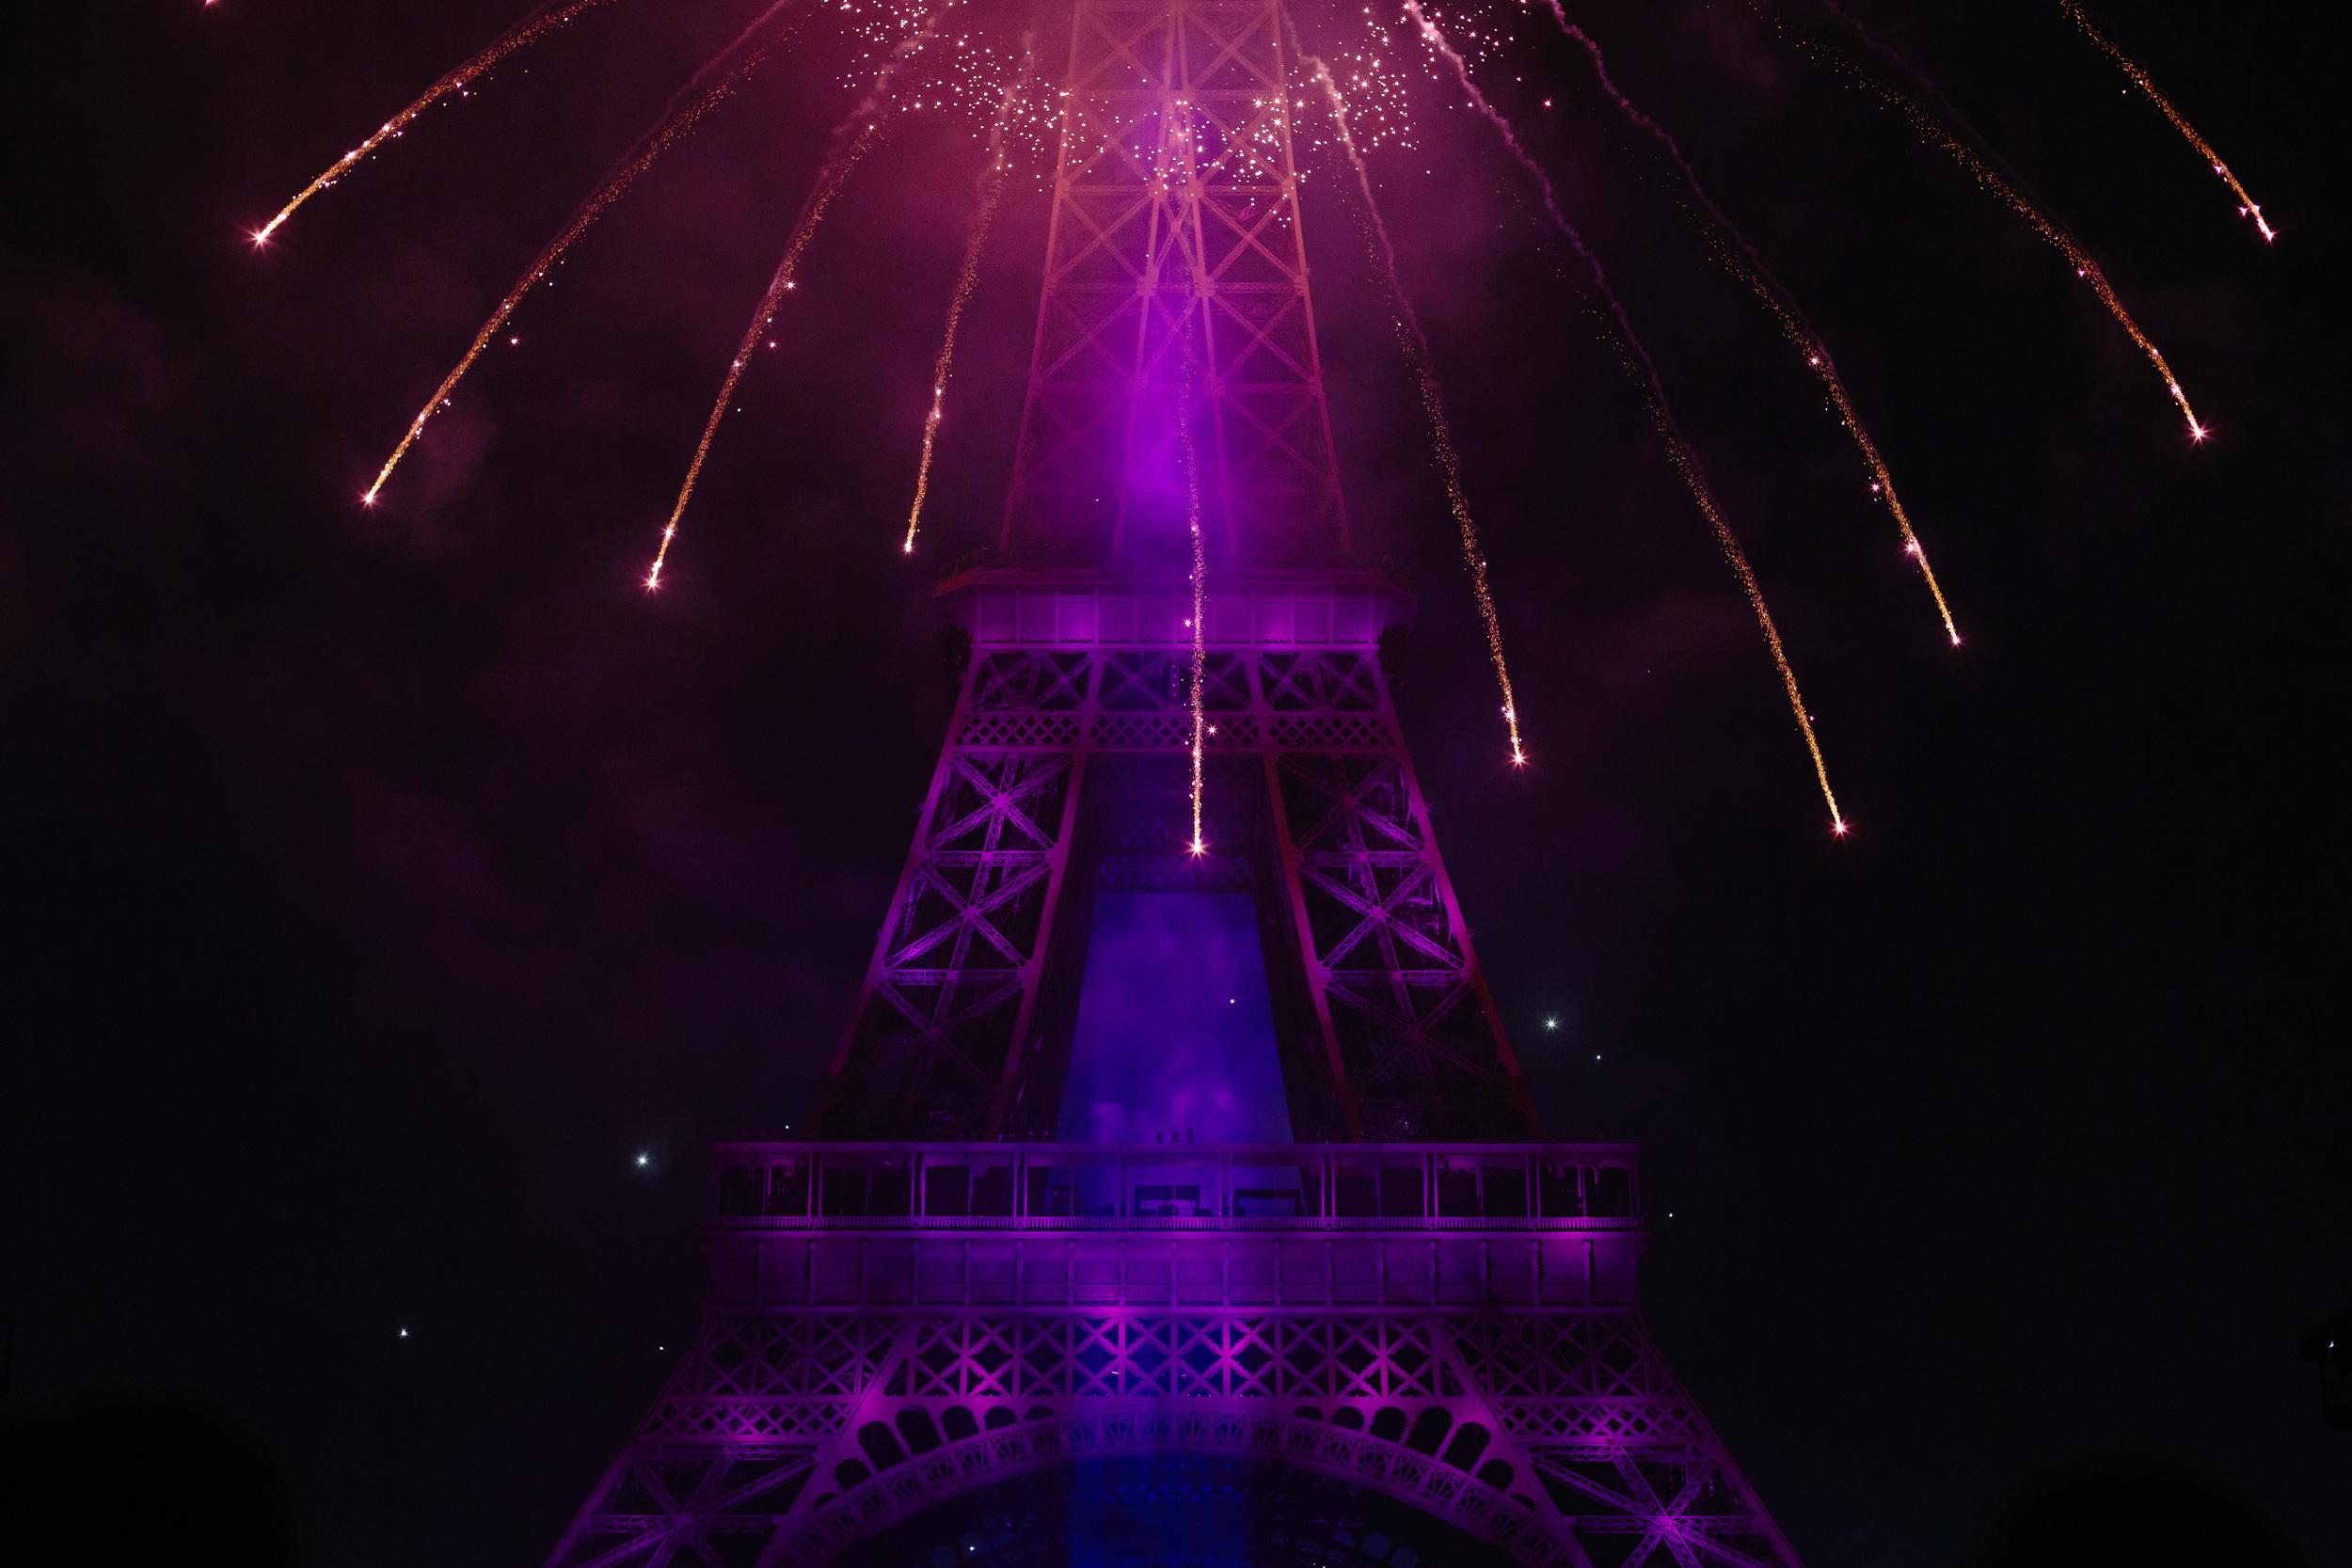 Paris Photographer, 14 juillet, Fireworks, Bastille2015, Eiffel Tower, Iheartparisfr